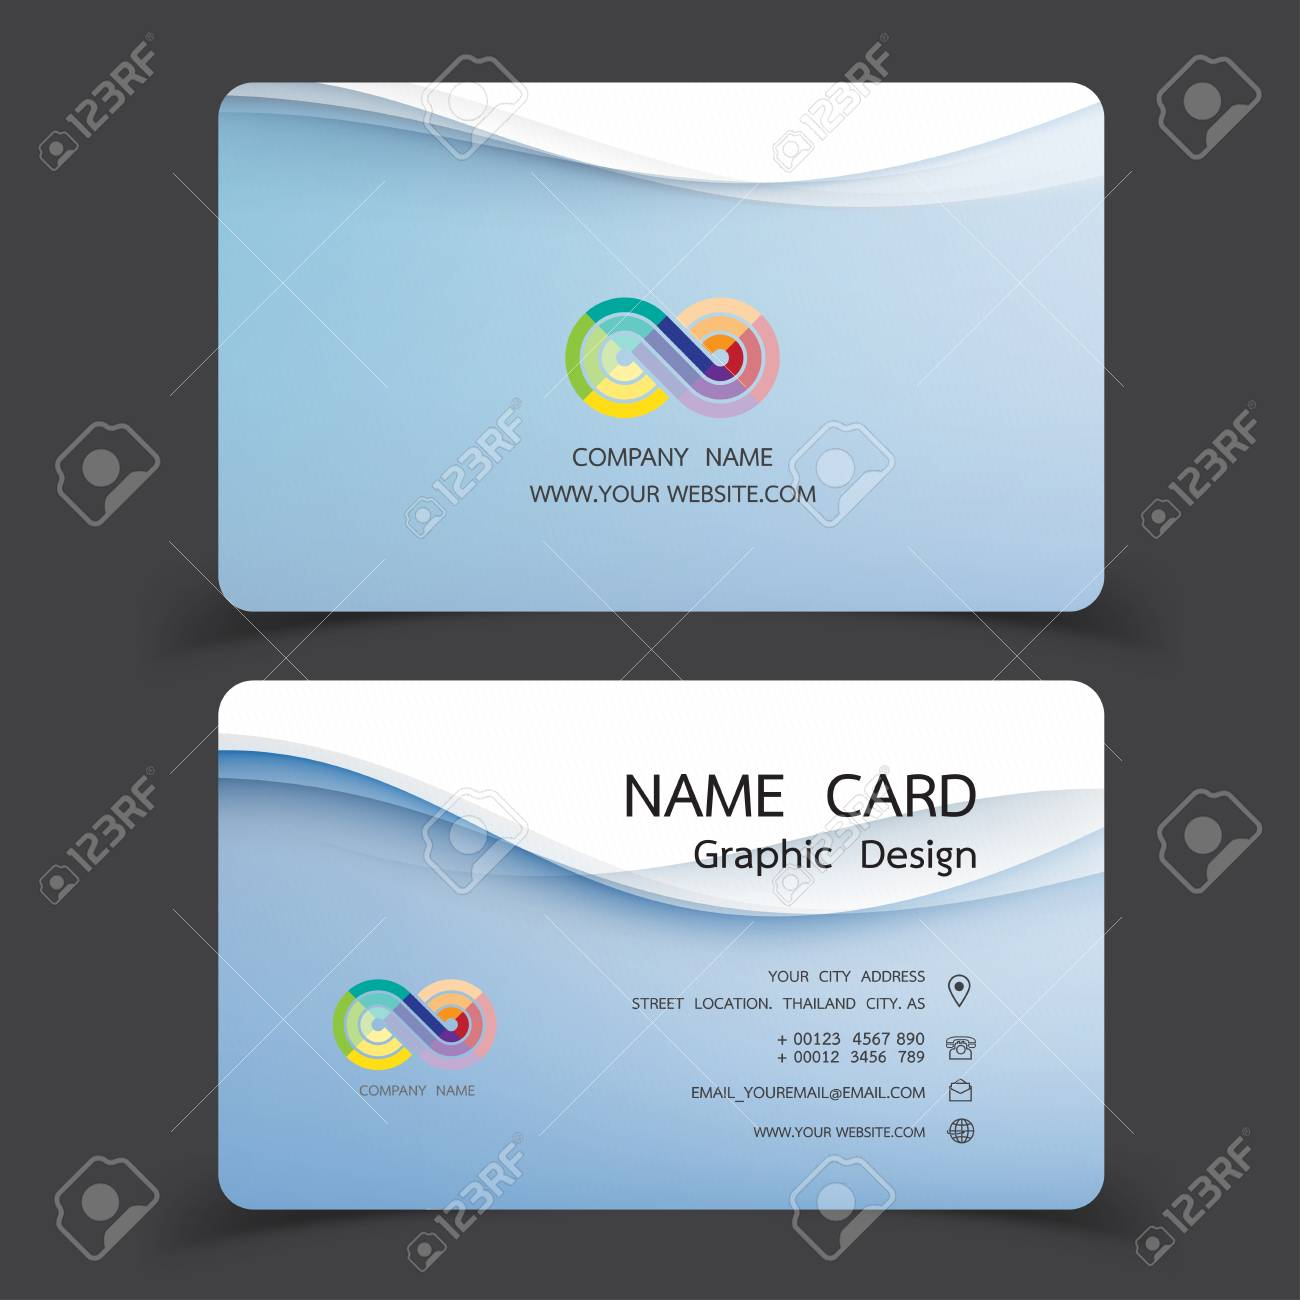 Business card design set modern creative business card template business card design set modern creative business card template vector illustrations stock vector reheart Images